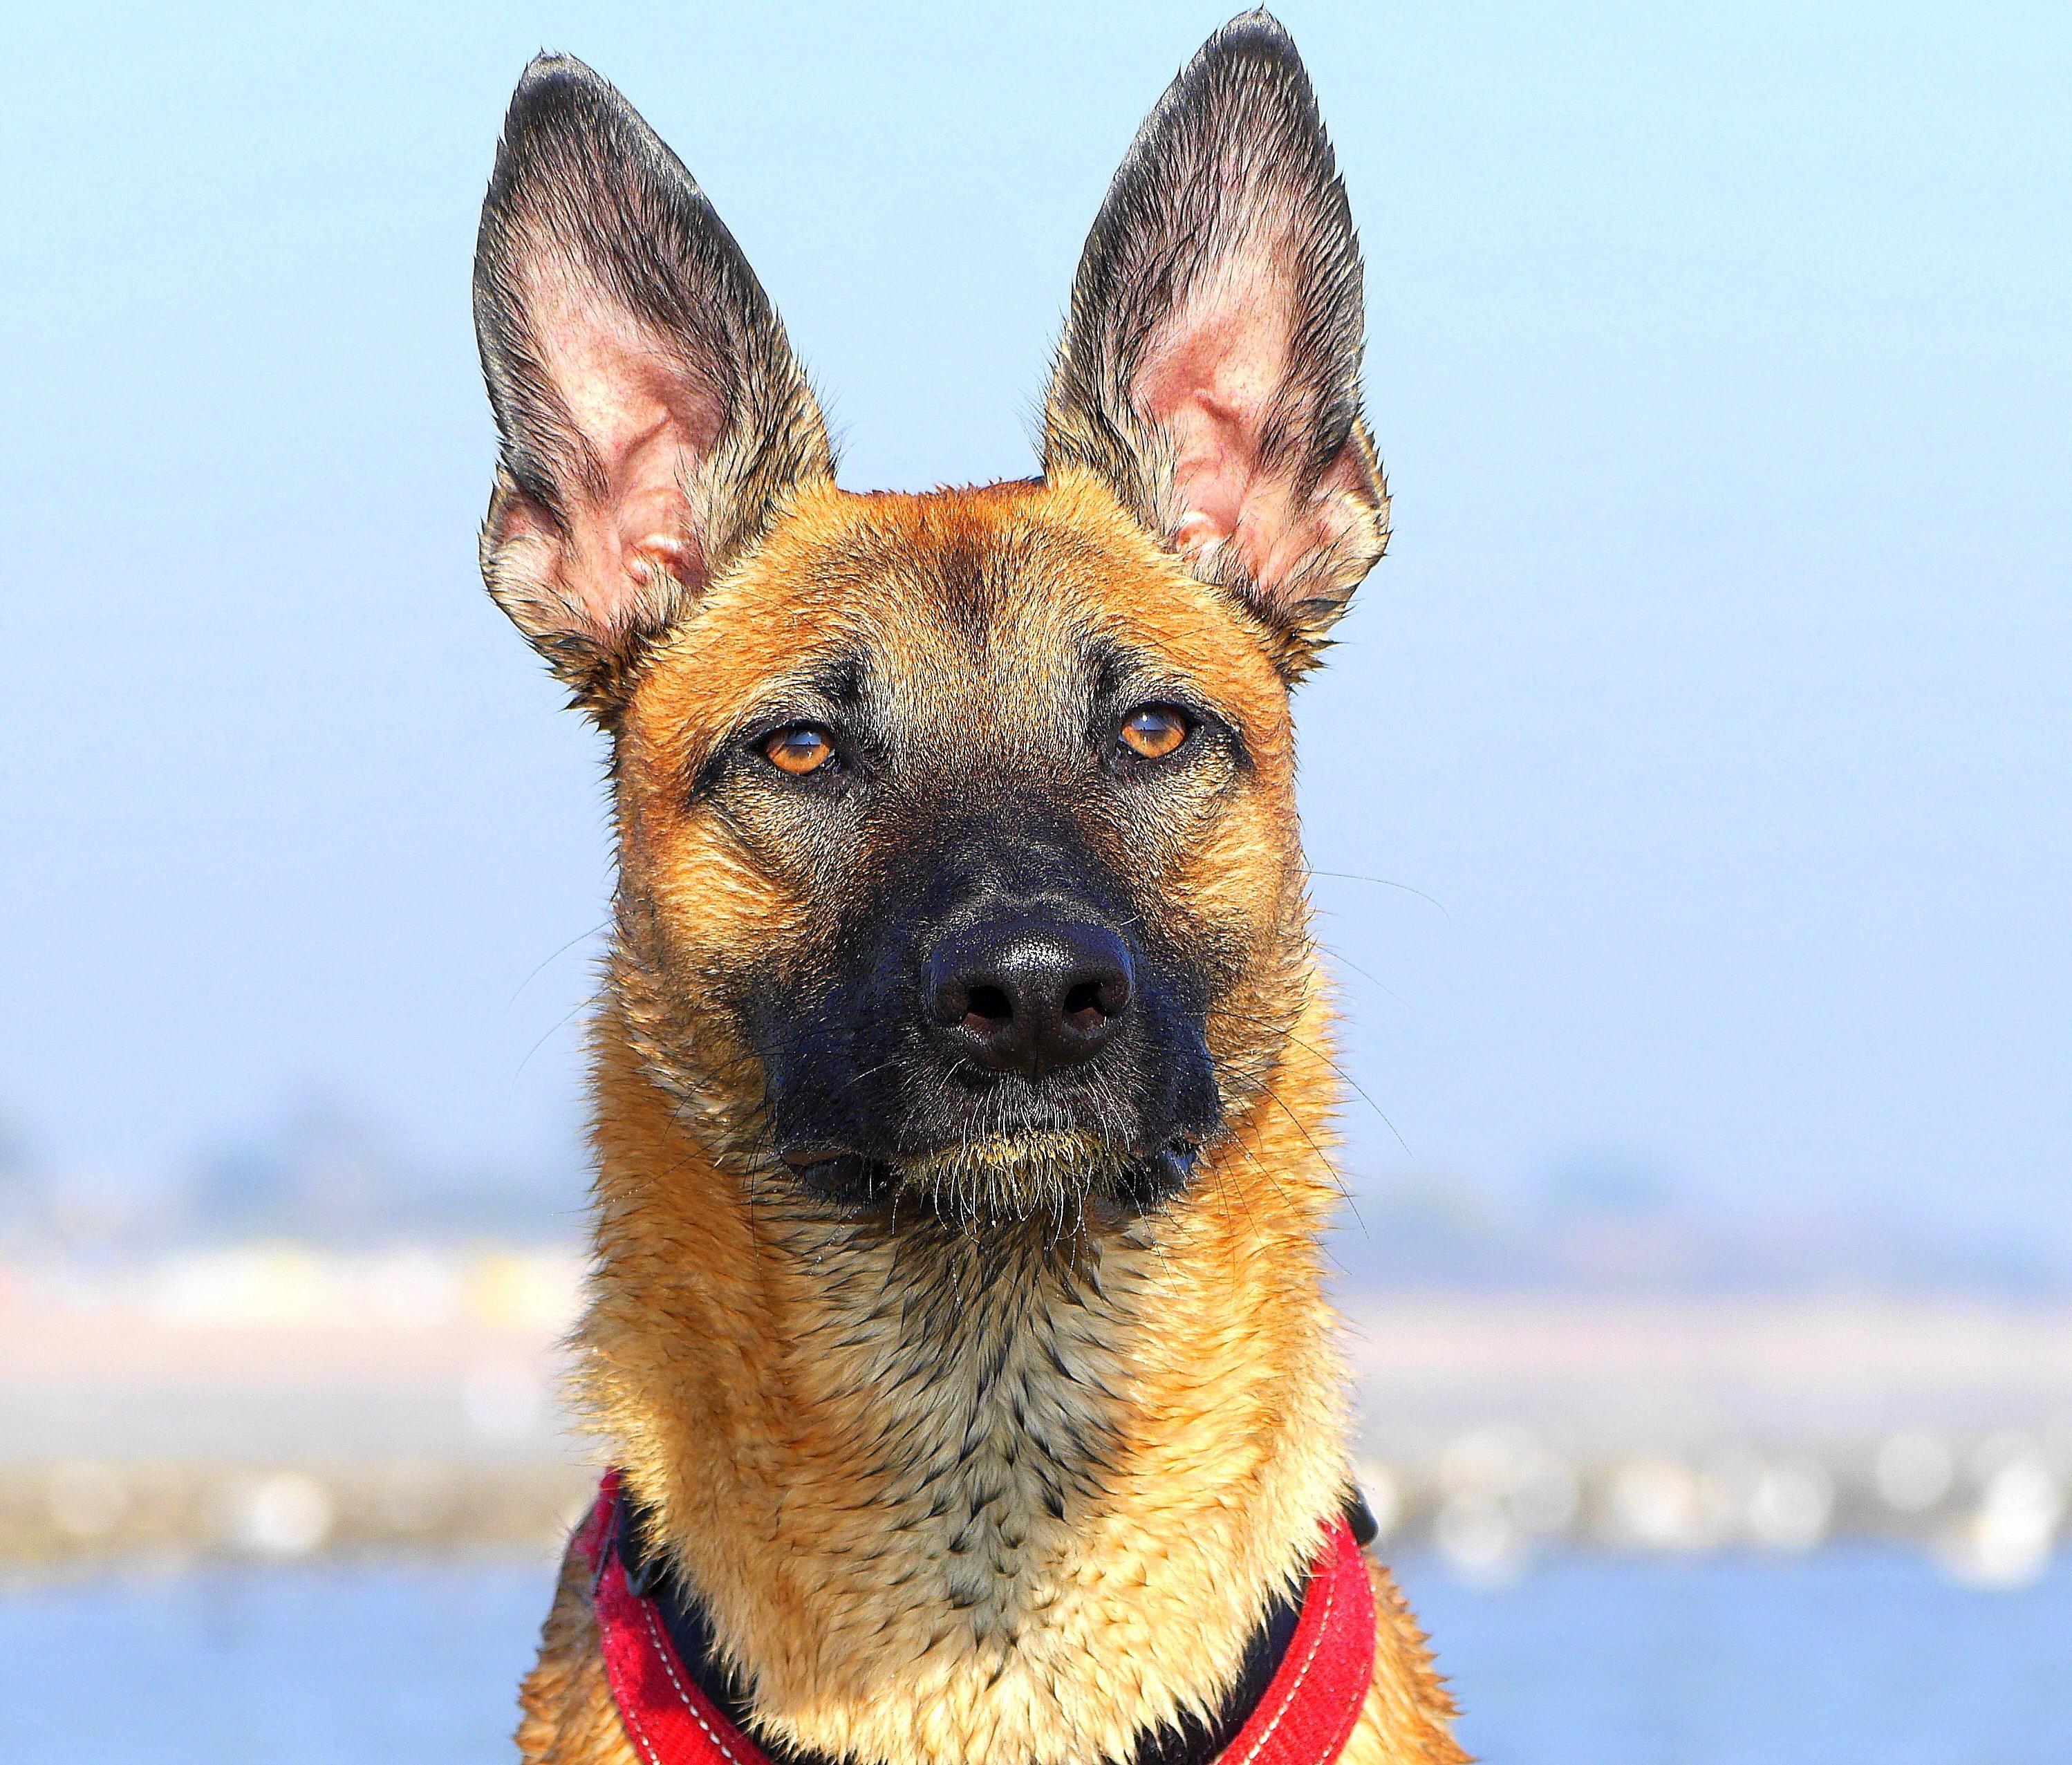 My dog Wilson has the biggest ears